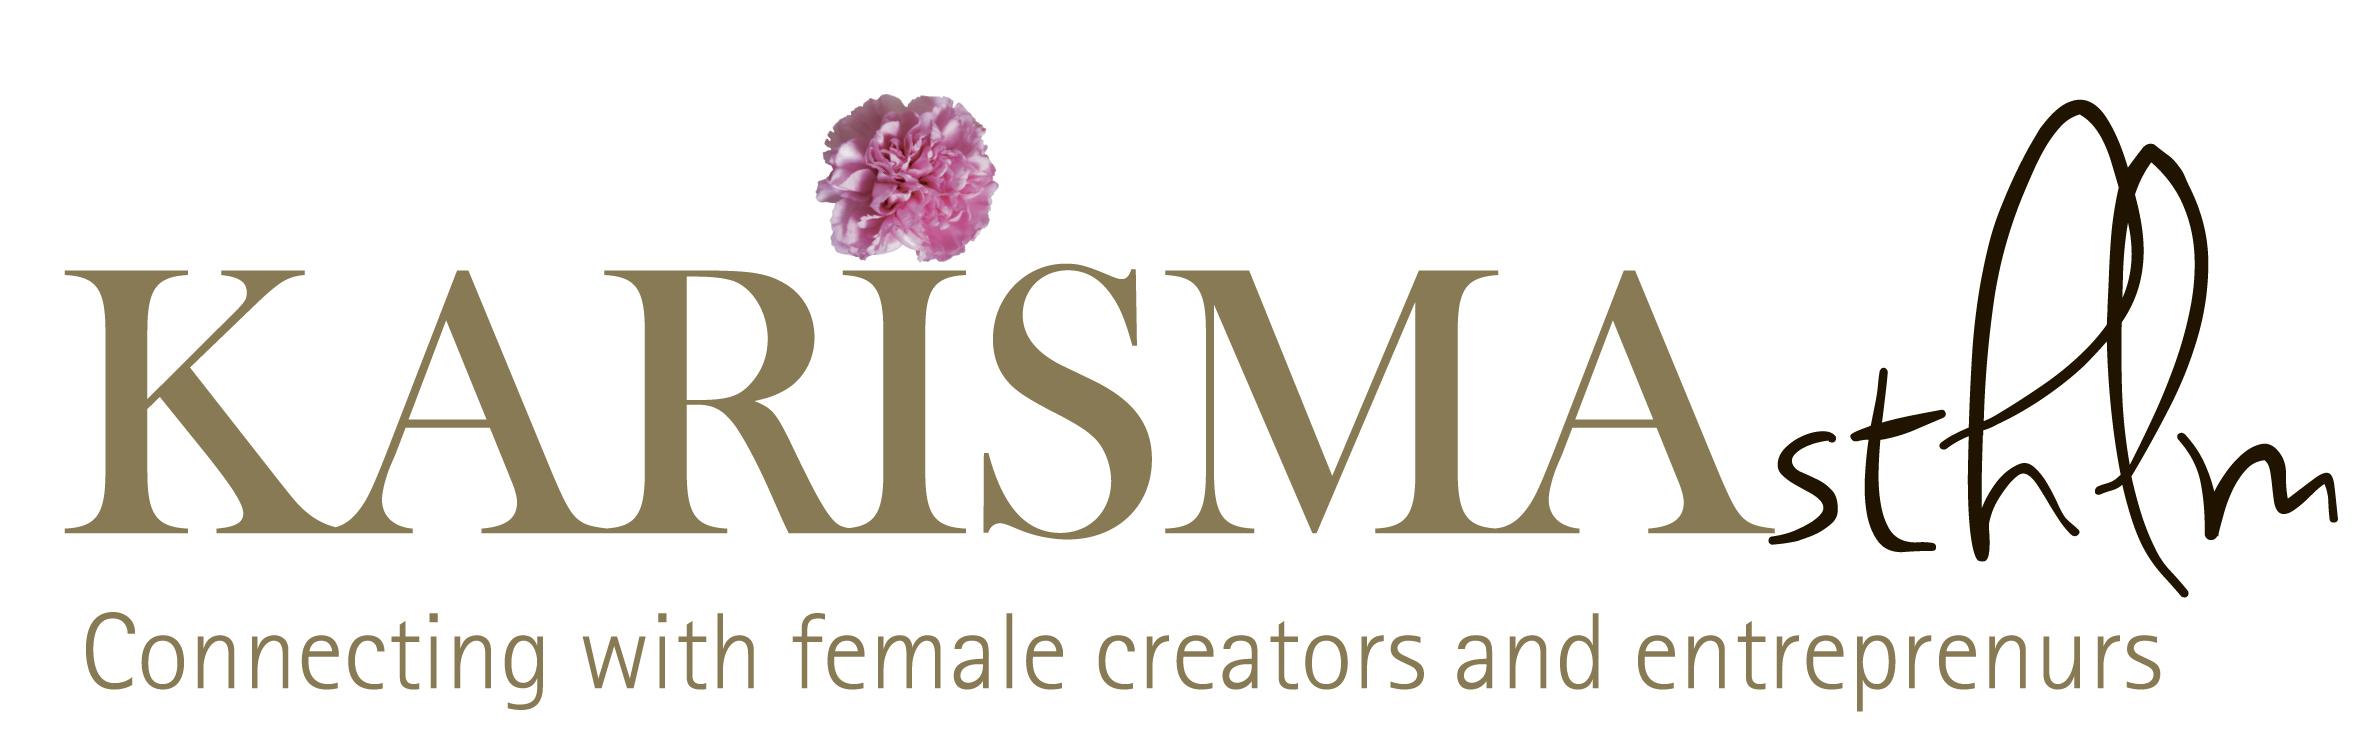 KARISMAsthlm_logo2017_mobil